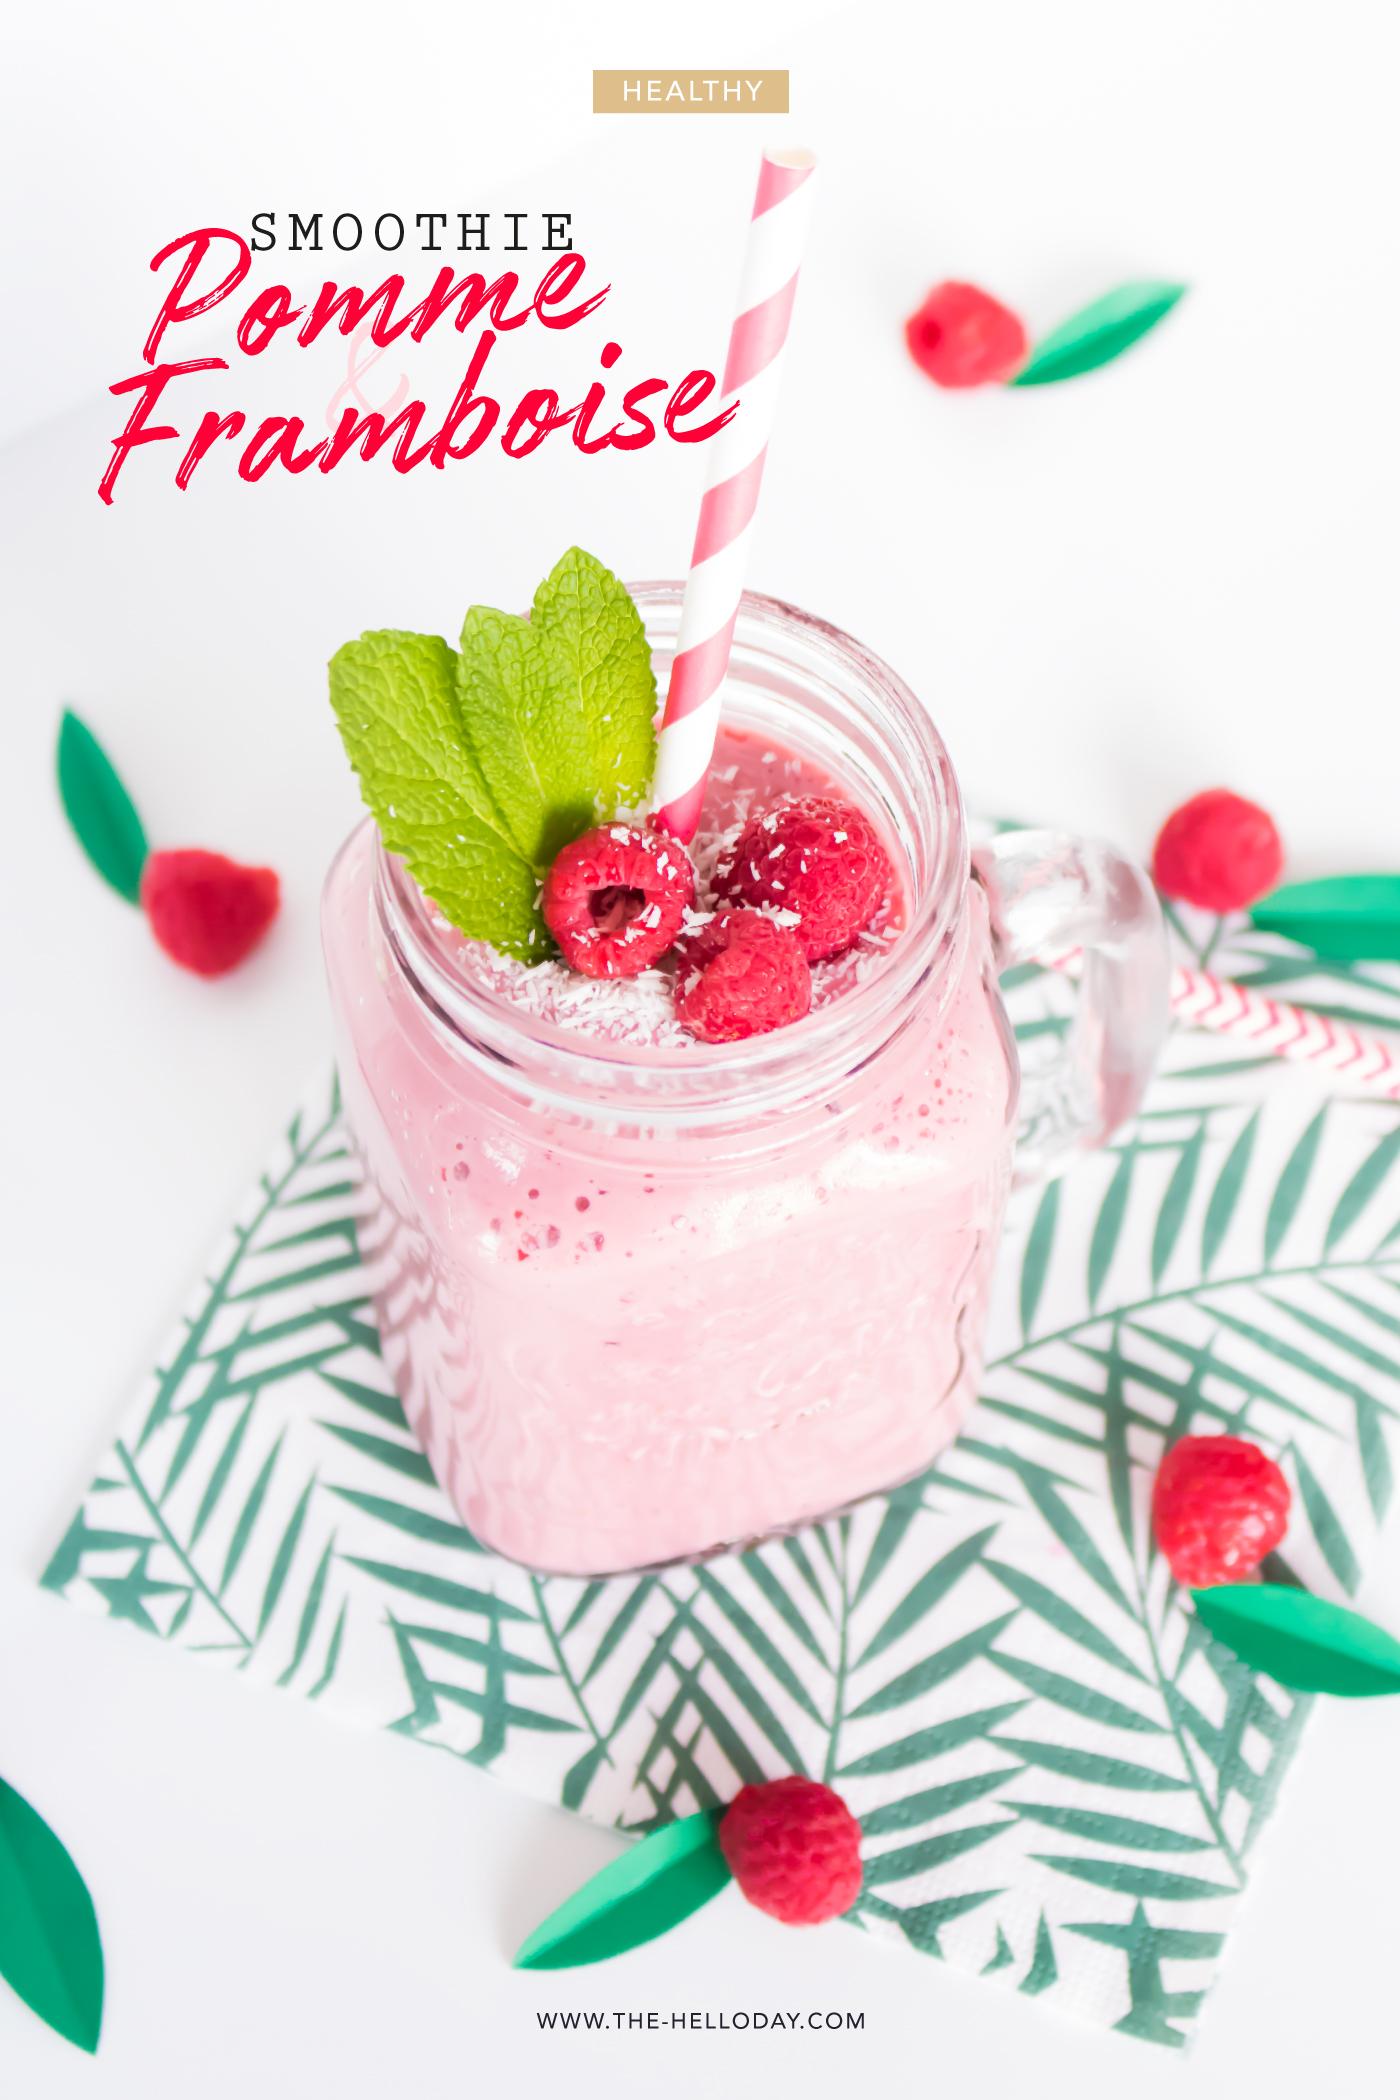 Smoothie Pomme Framboise